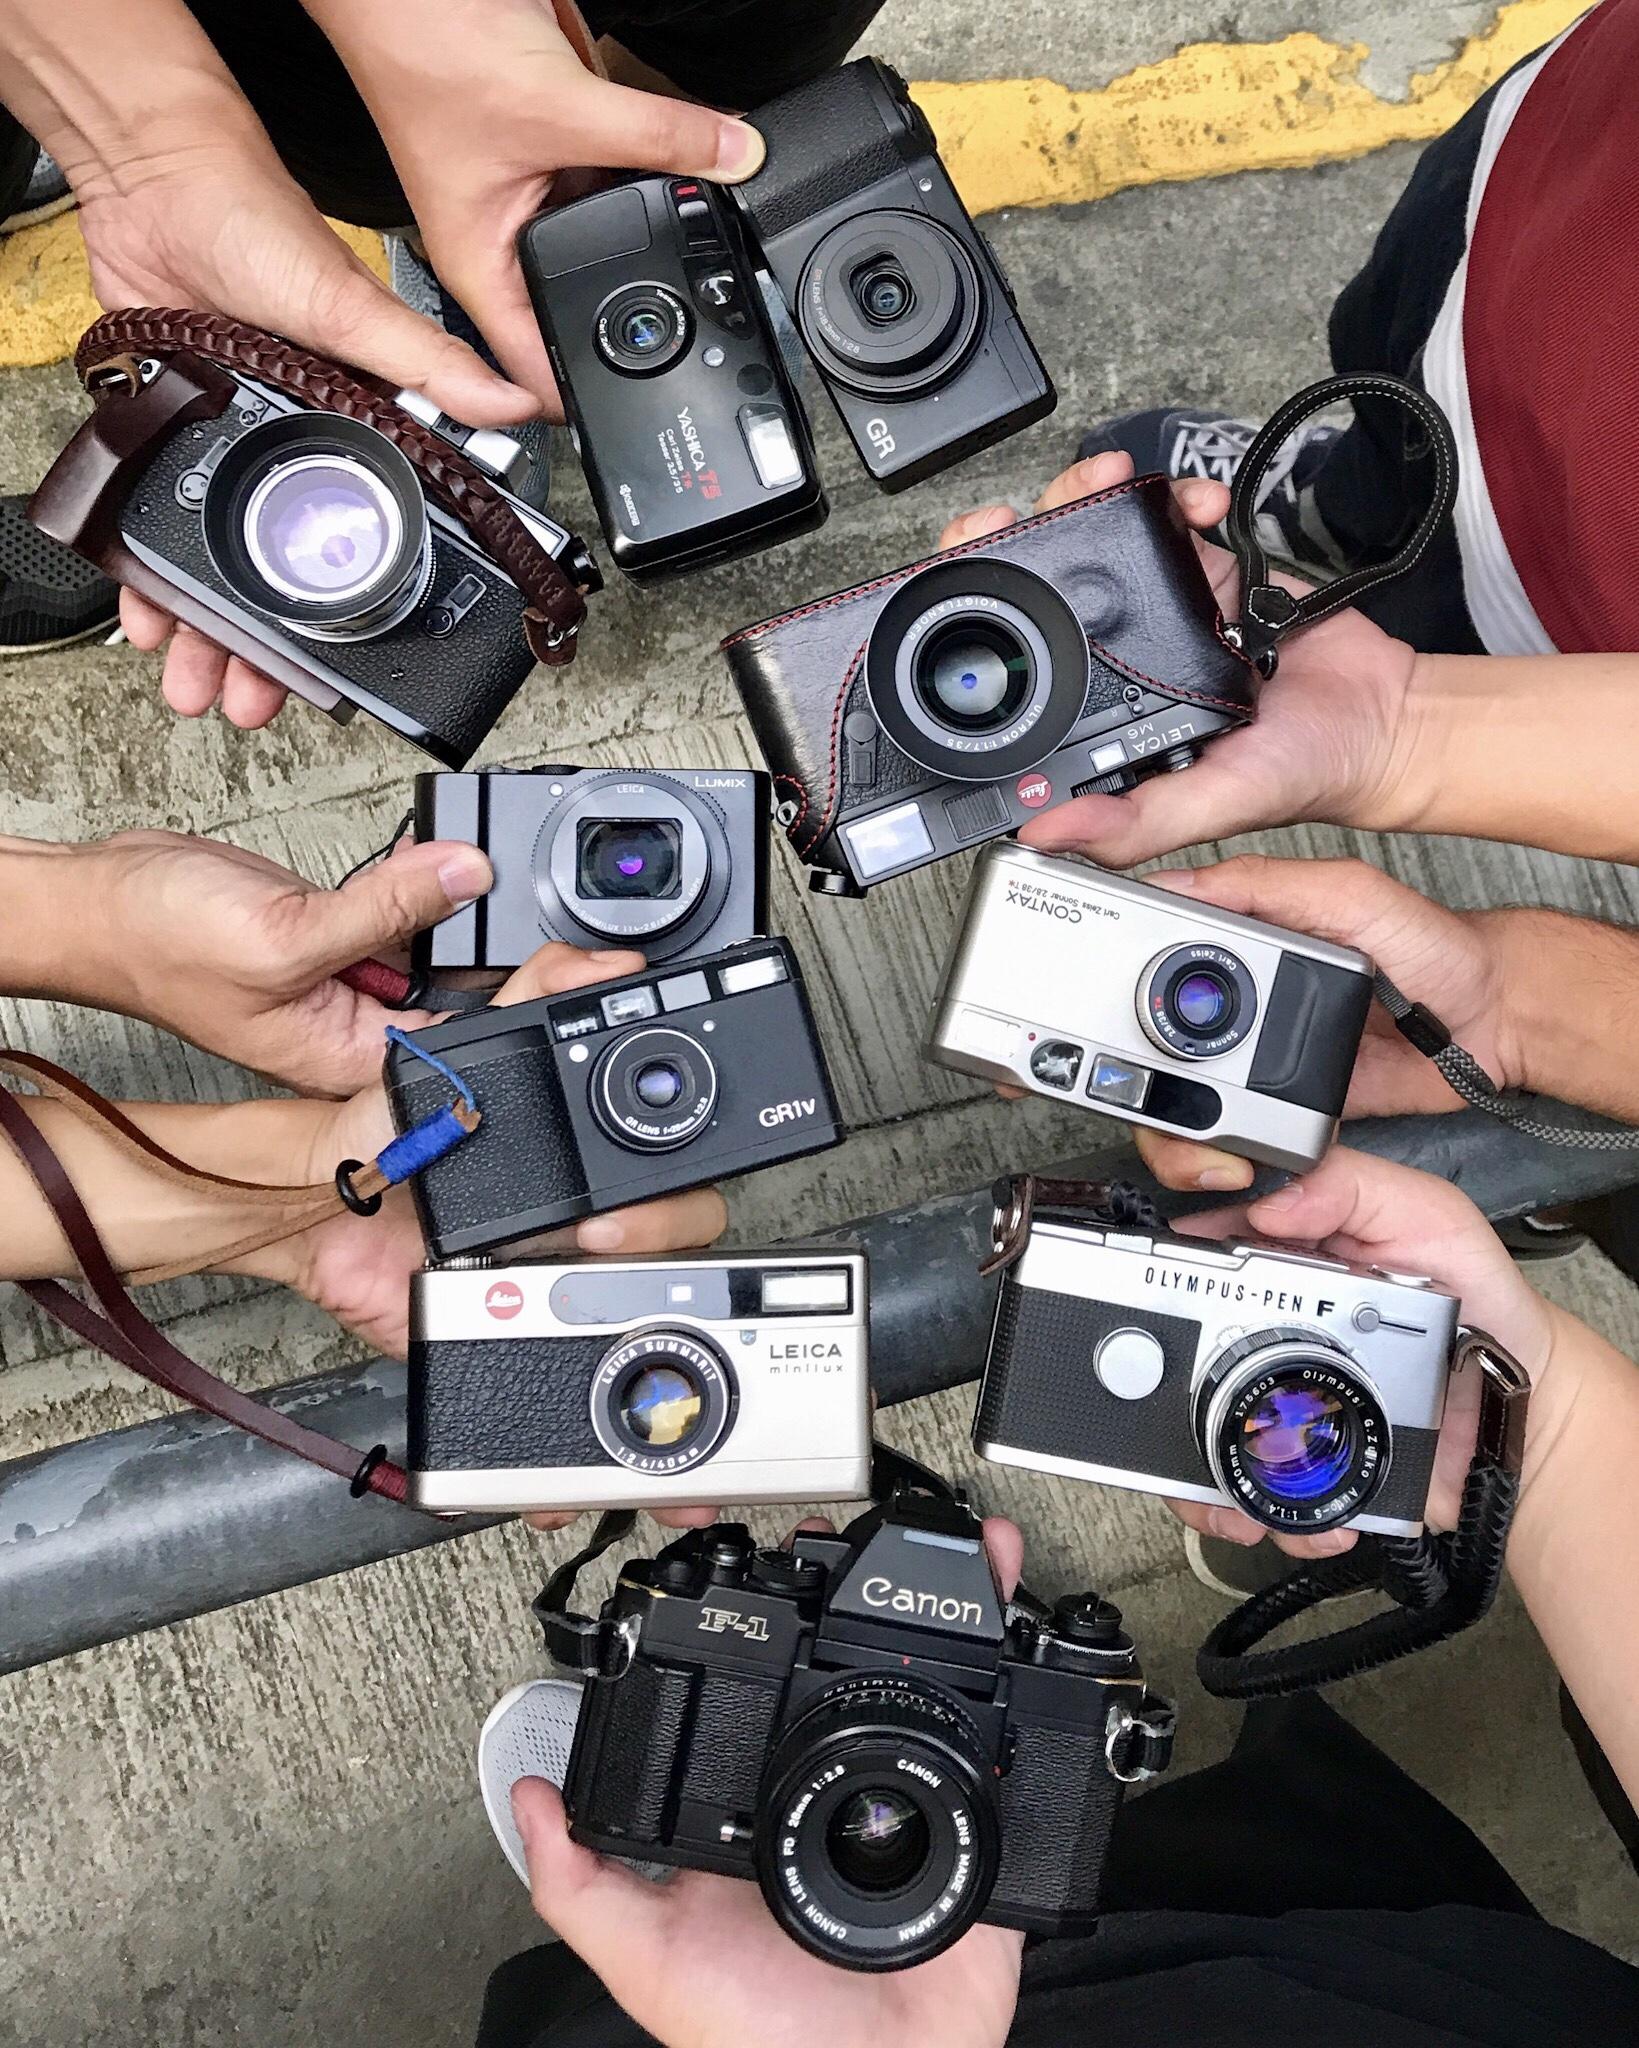 Photowalk Hong Kong street photography film cameras